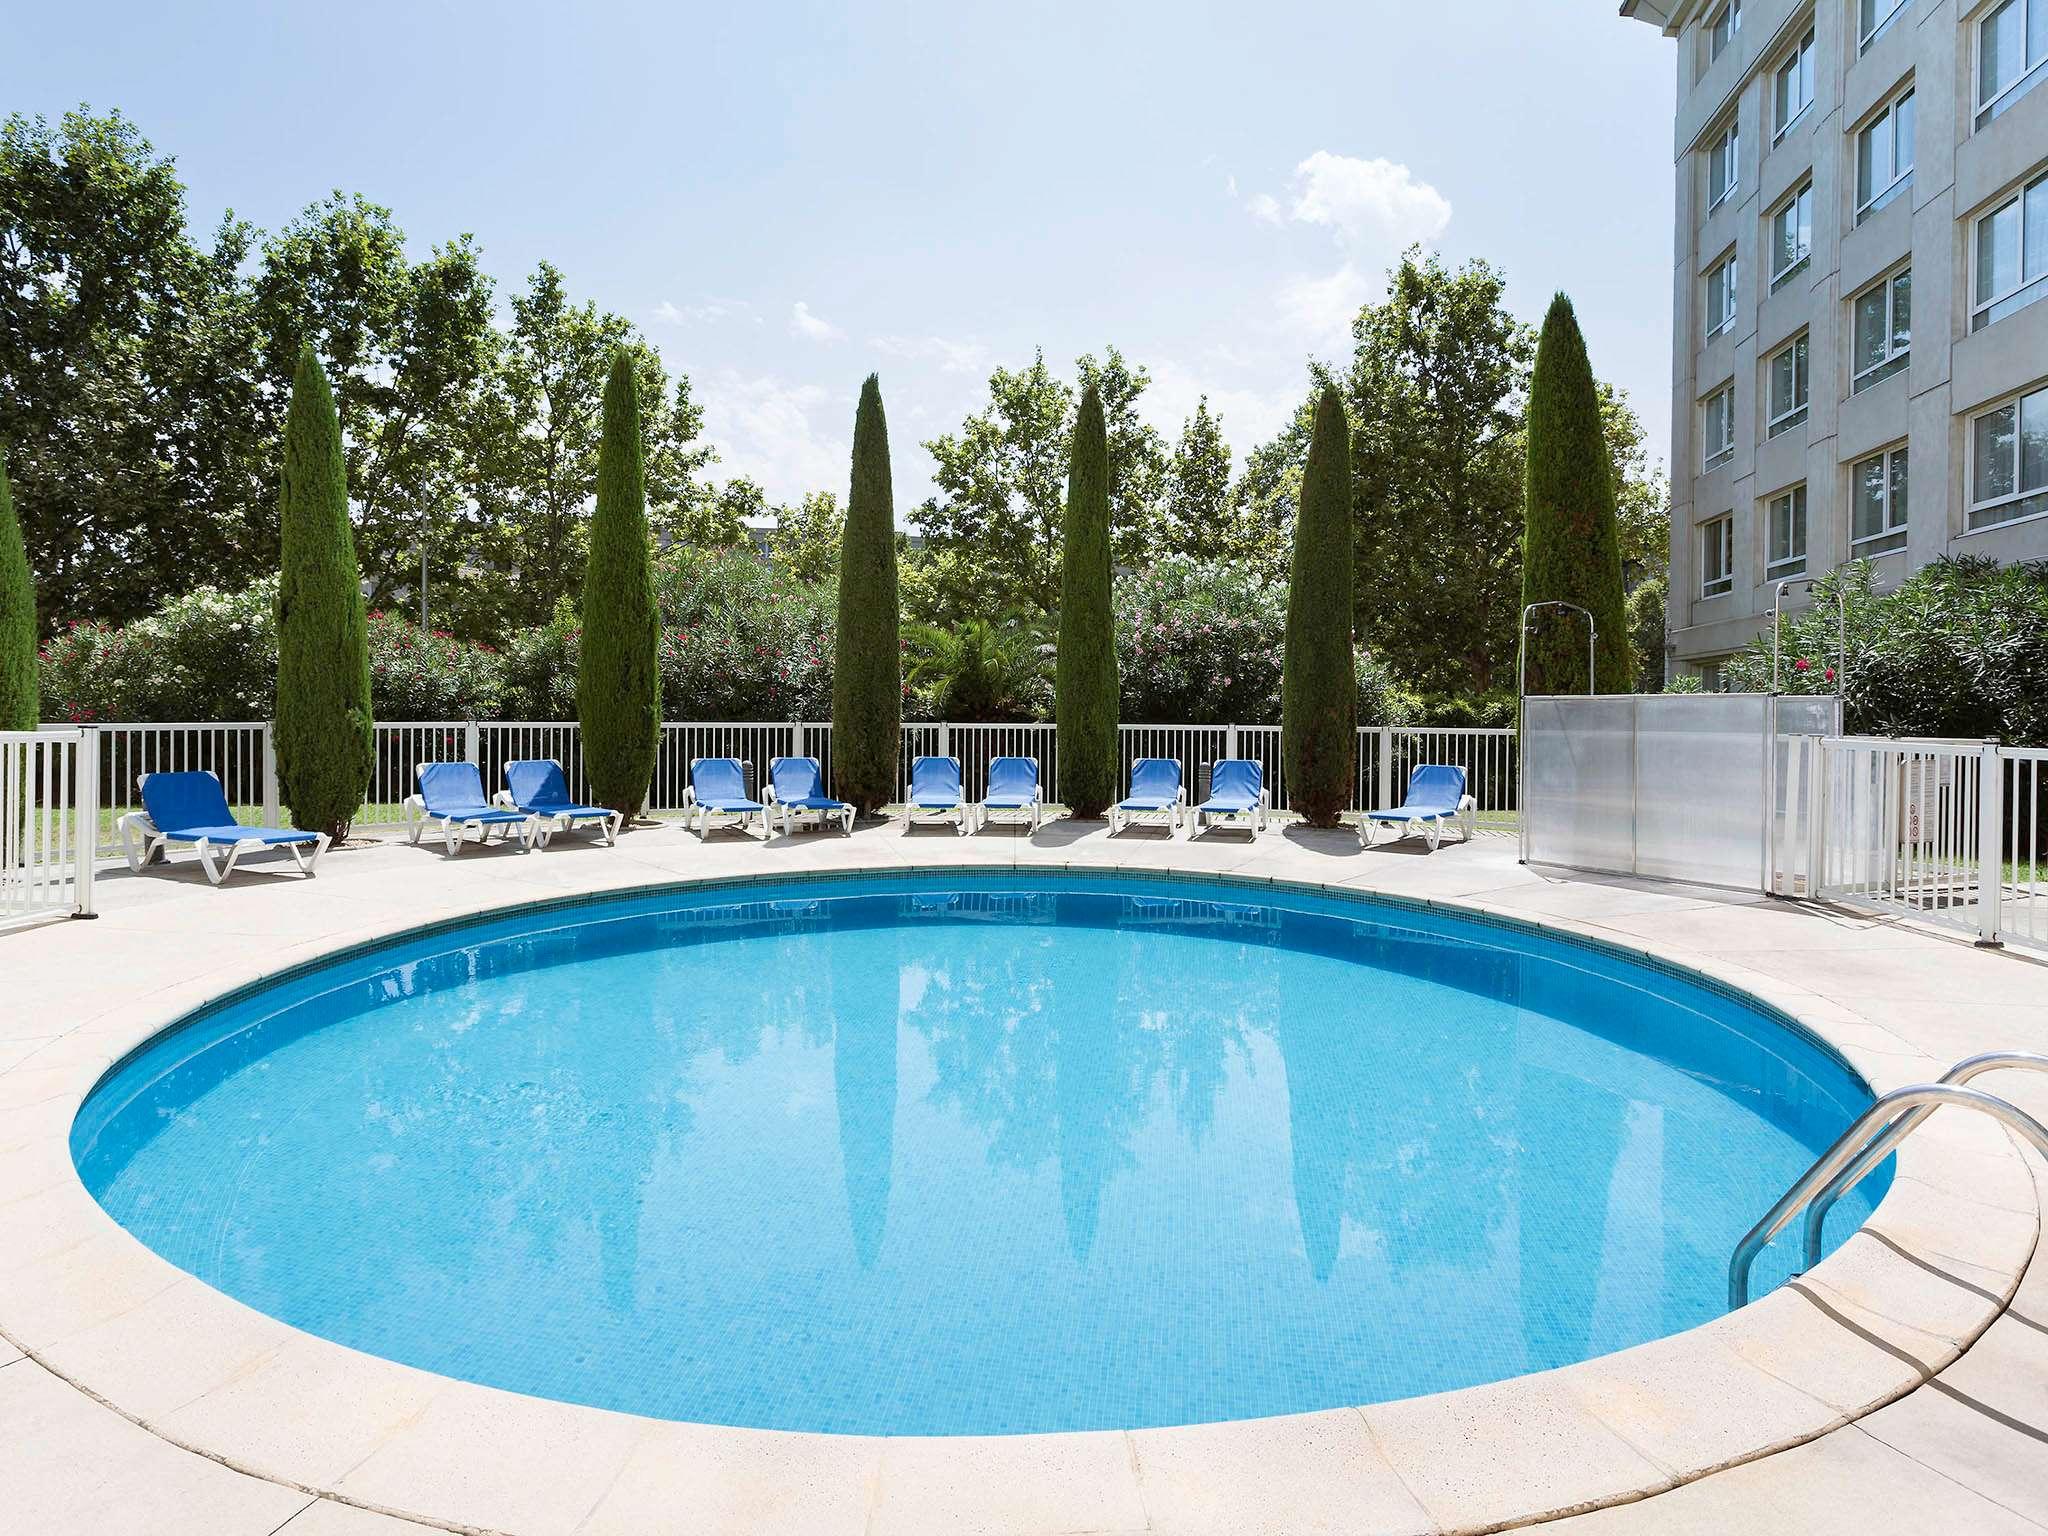 Hotel – Novotel Suites Montpellier